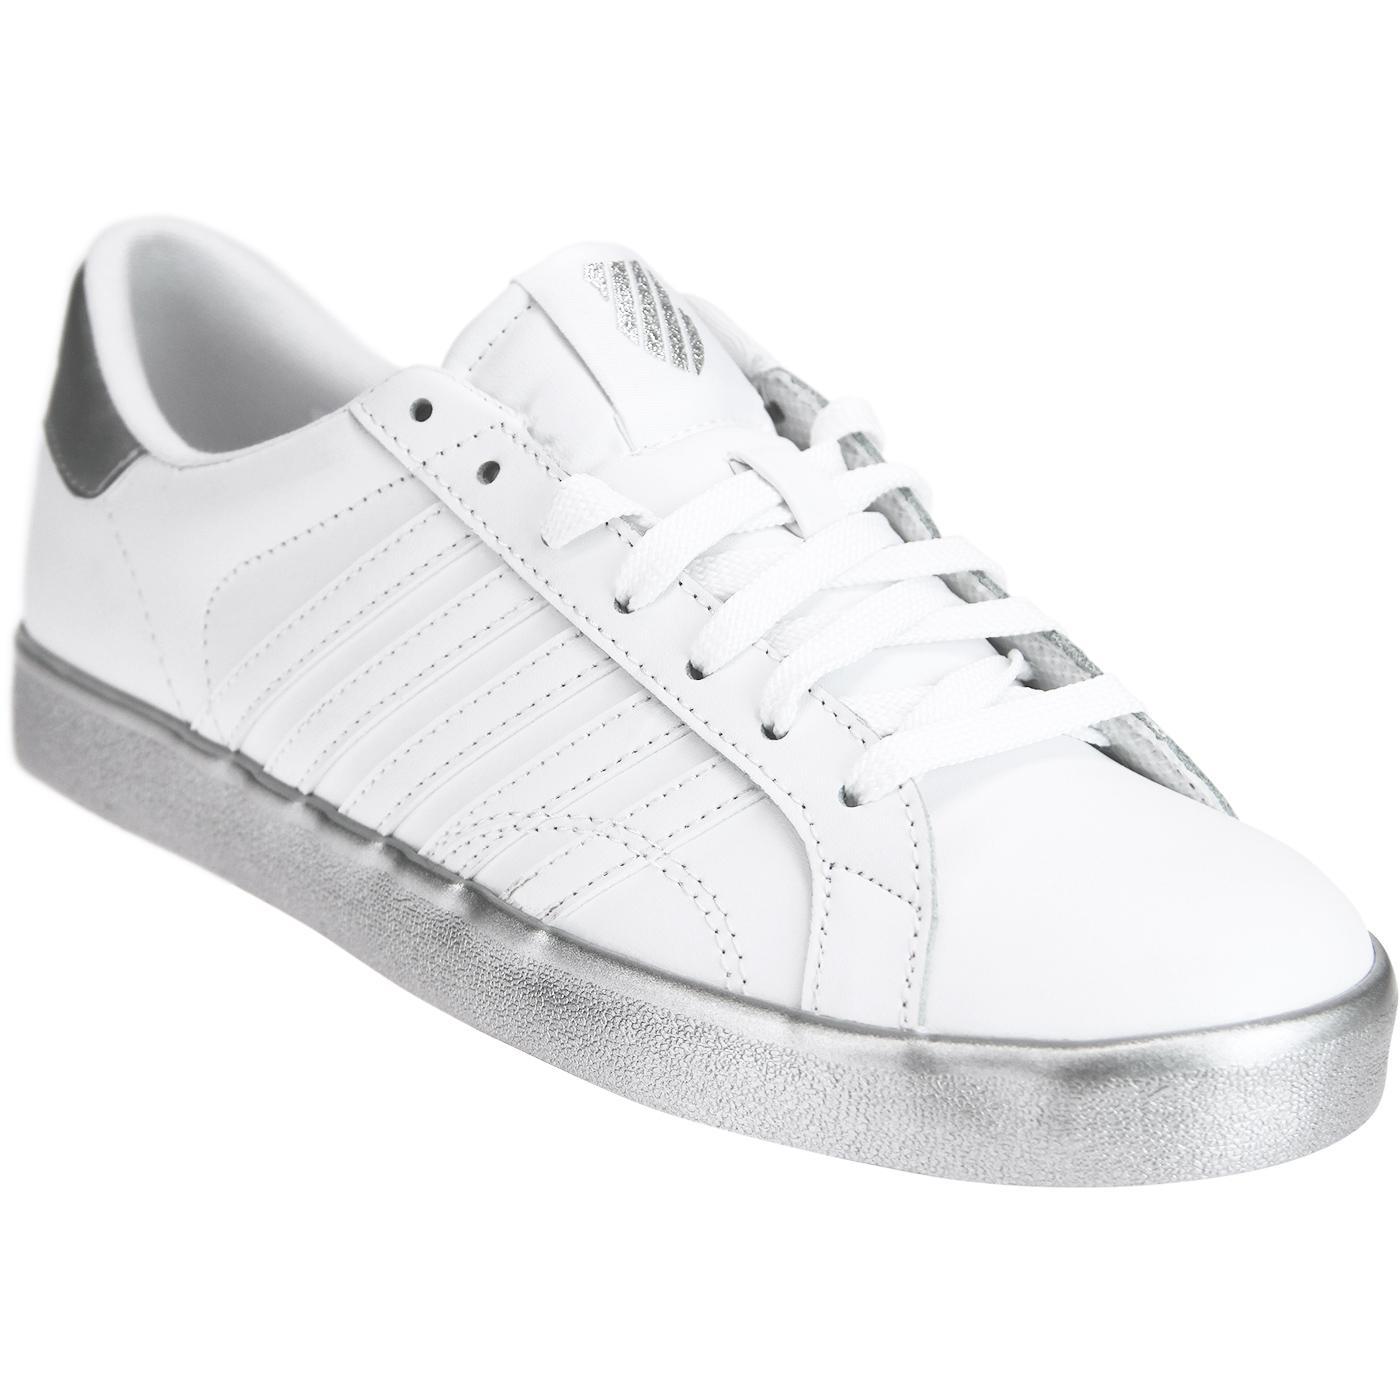 Belmont SO K-SWISS Retro Trainers (White/Silver)